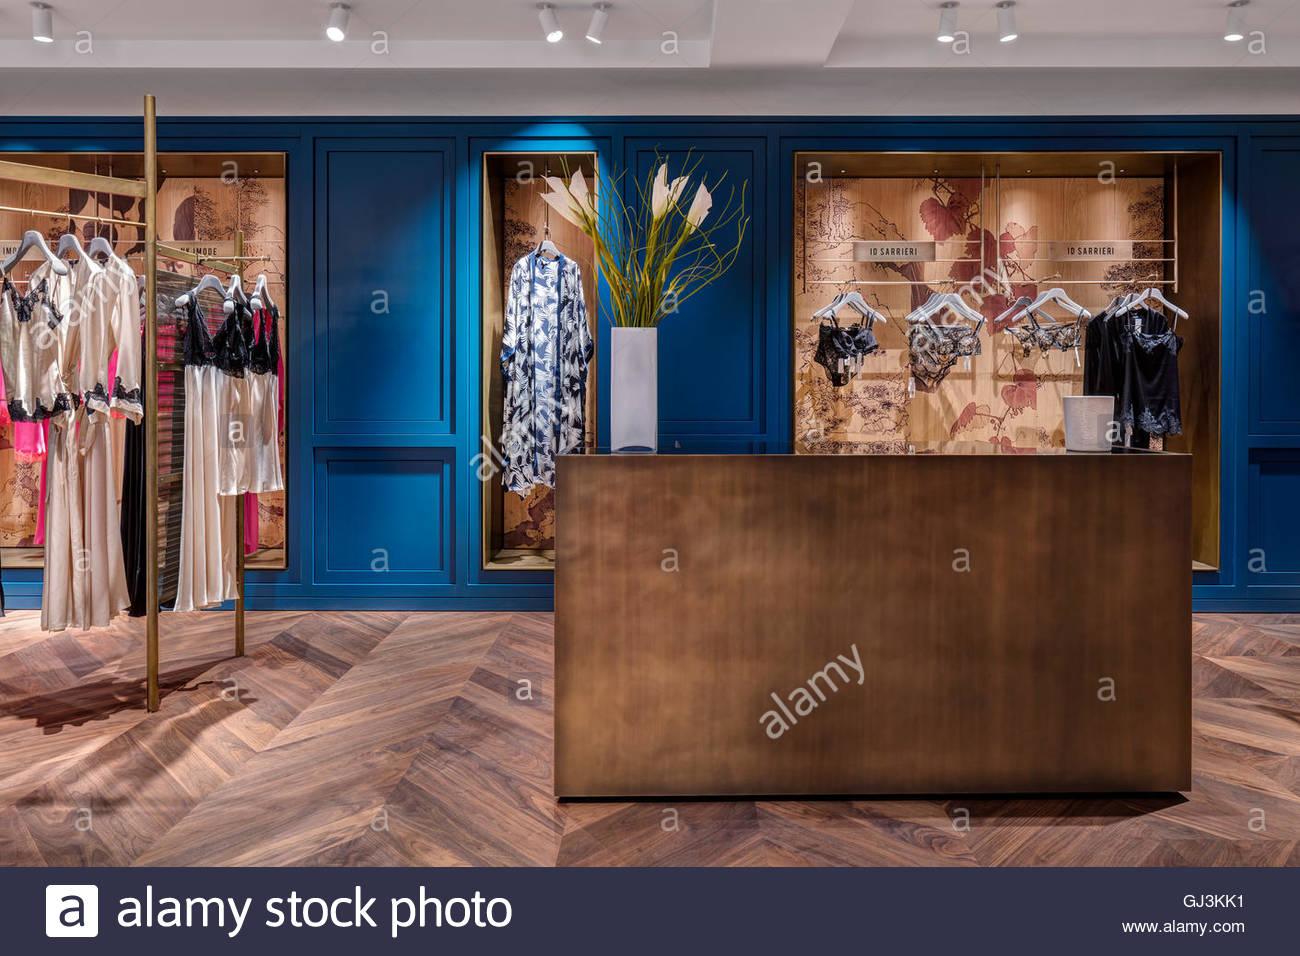 Nightwear space view. The Body Studio, London, United Kingdom. Architect: Neri&Hu, 2016. - Stock Image